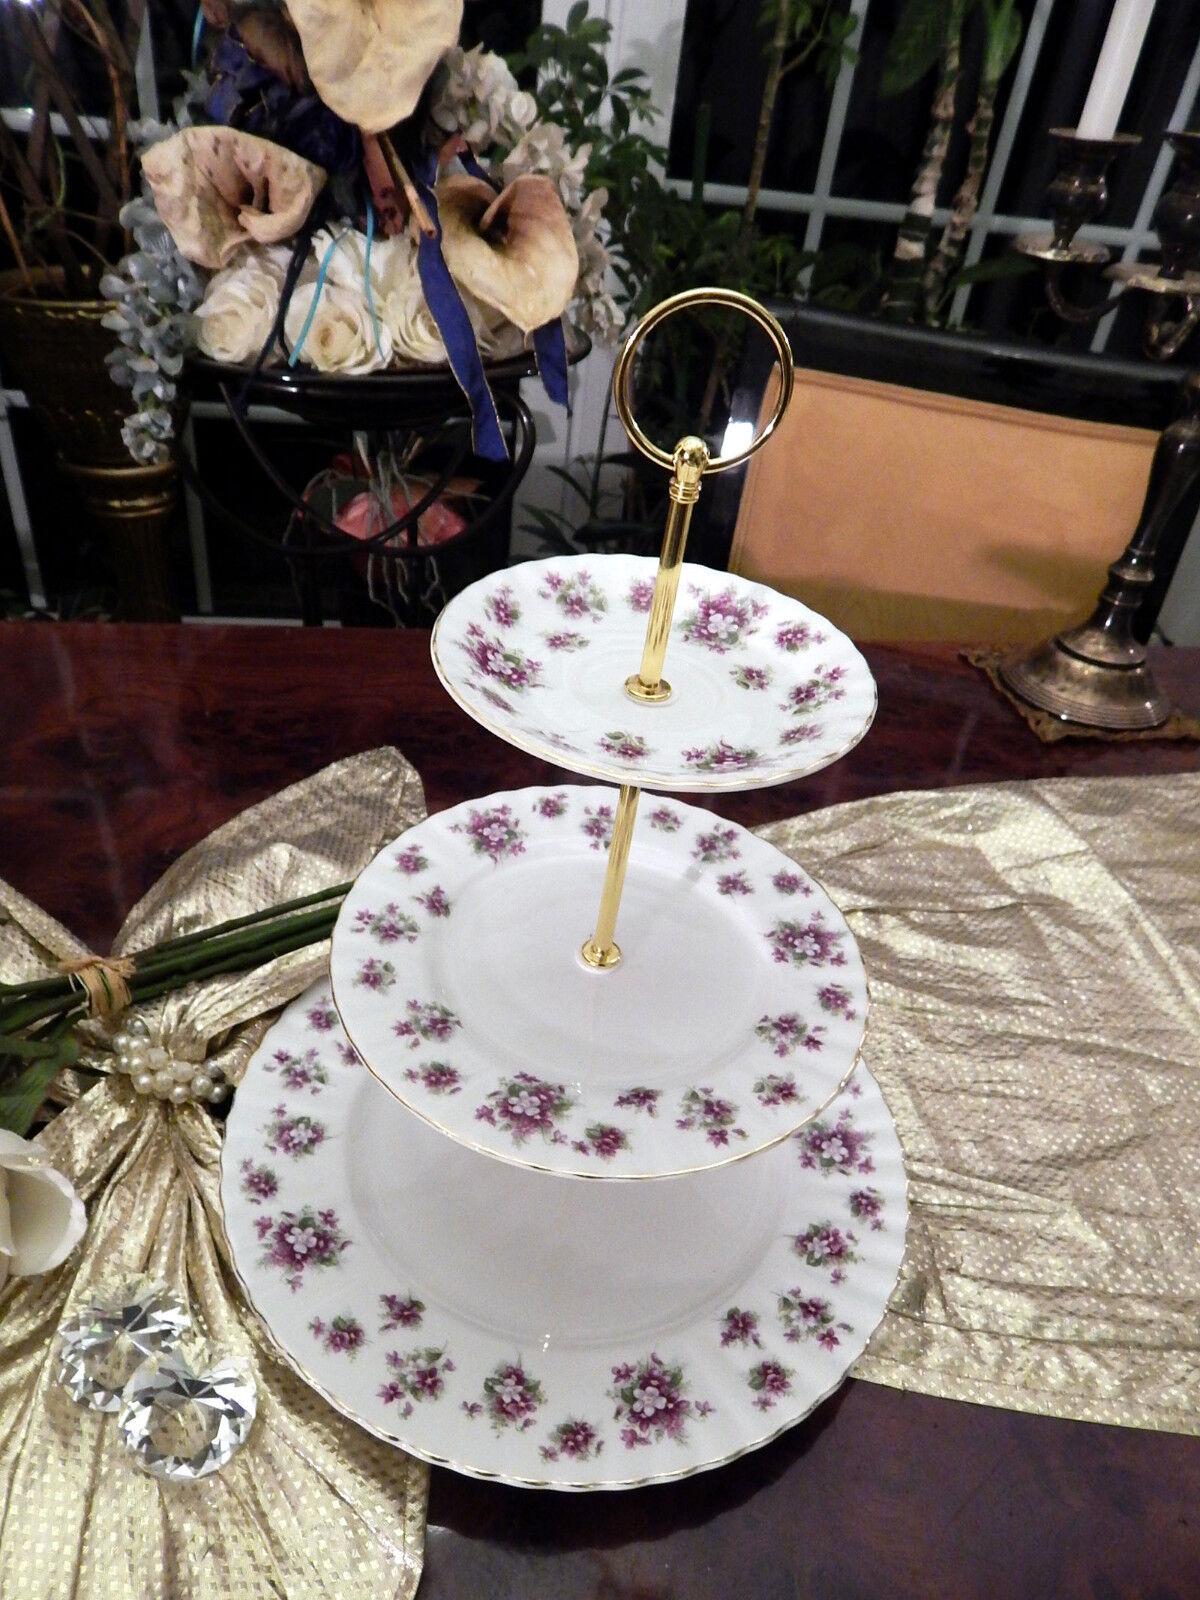 Edle große Etagere Tafelaufsatz 3stufig von Royal Albert England Sweet lilas     | Moderne Muster